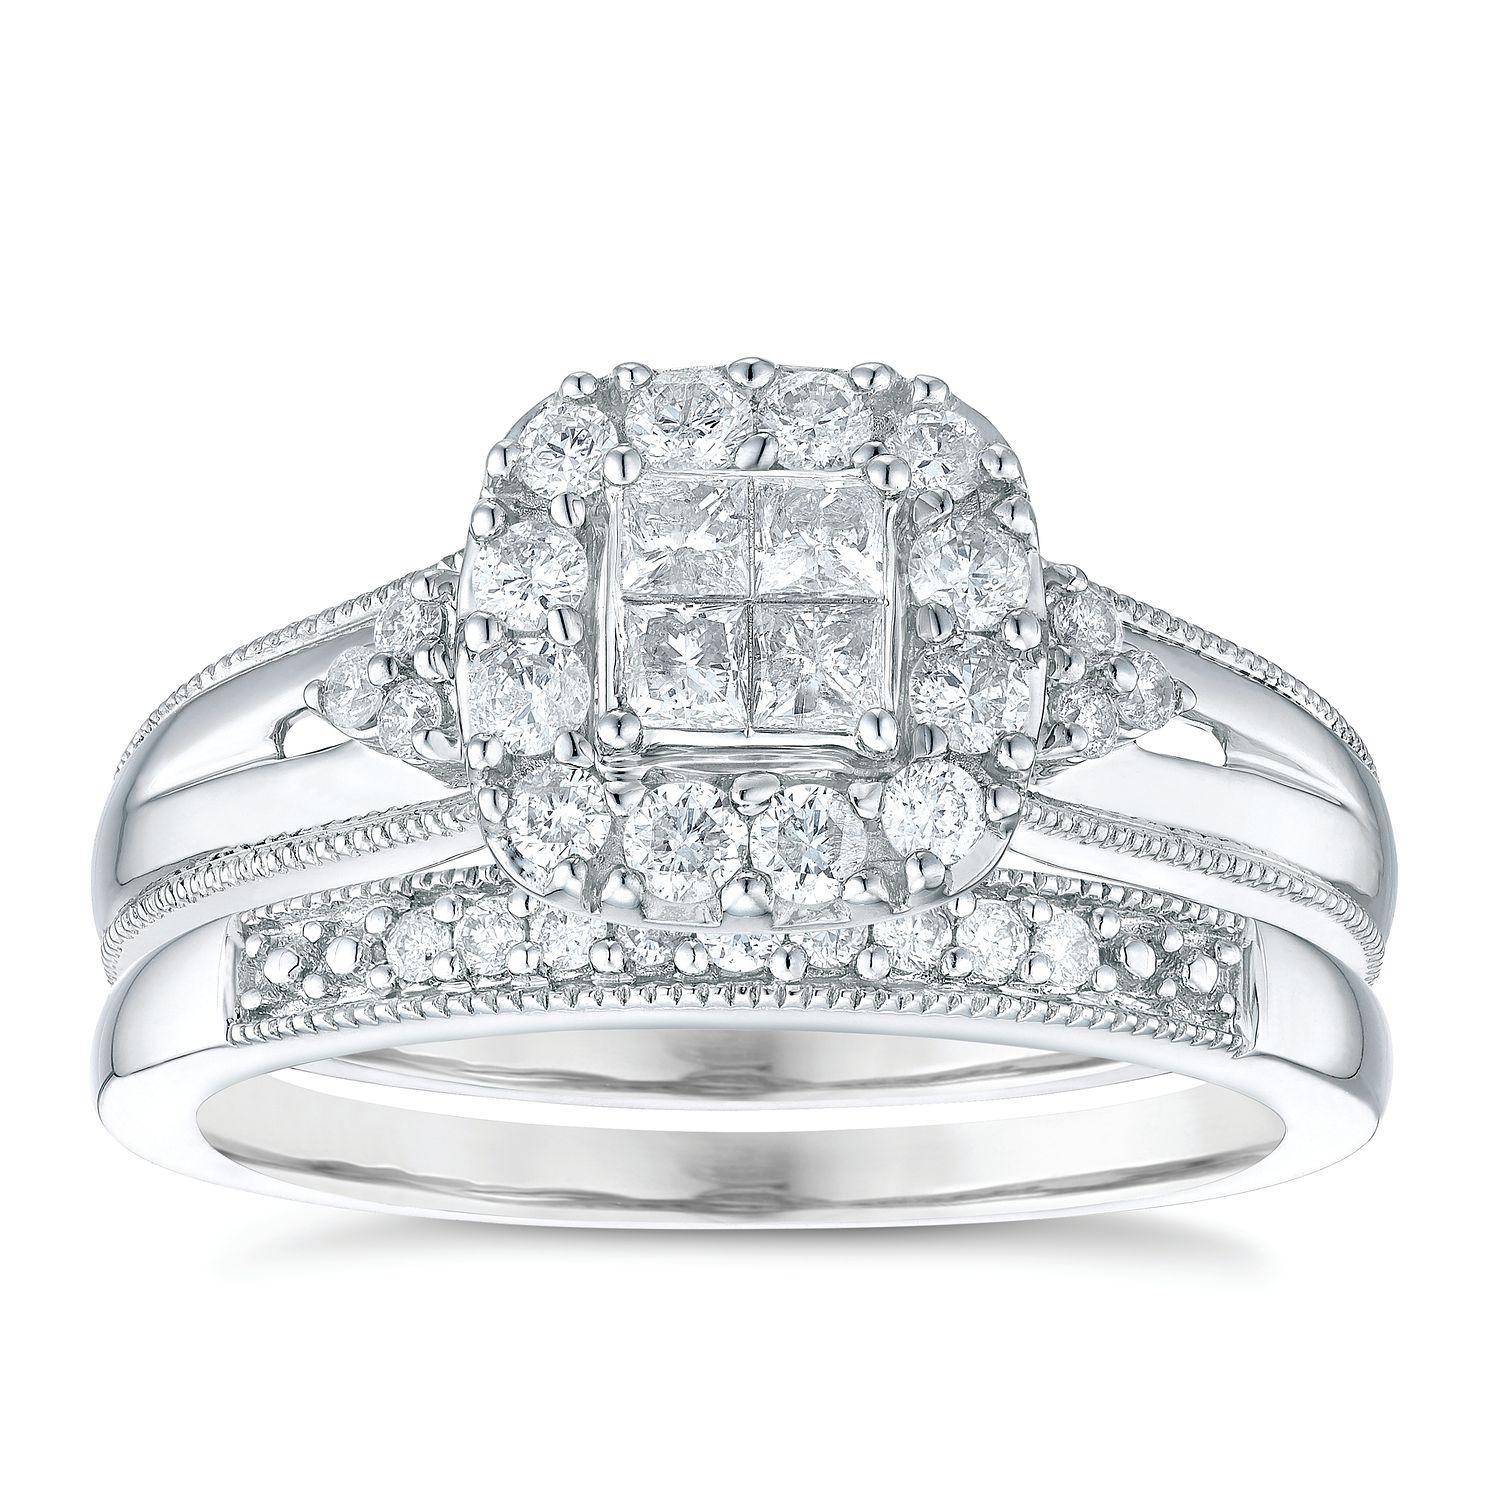 Bridal Set Diamond Rings